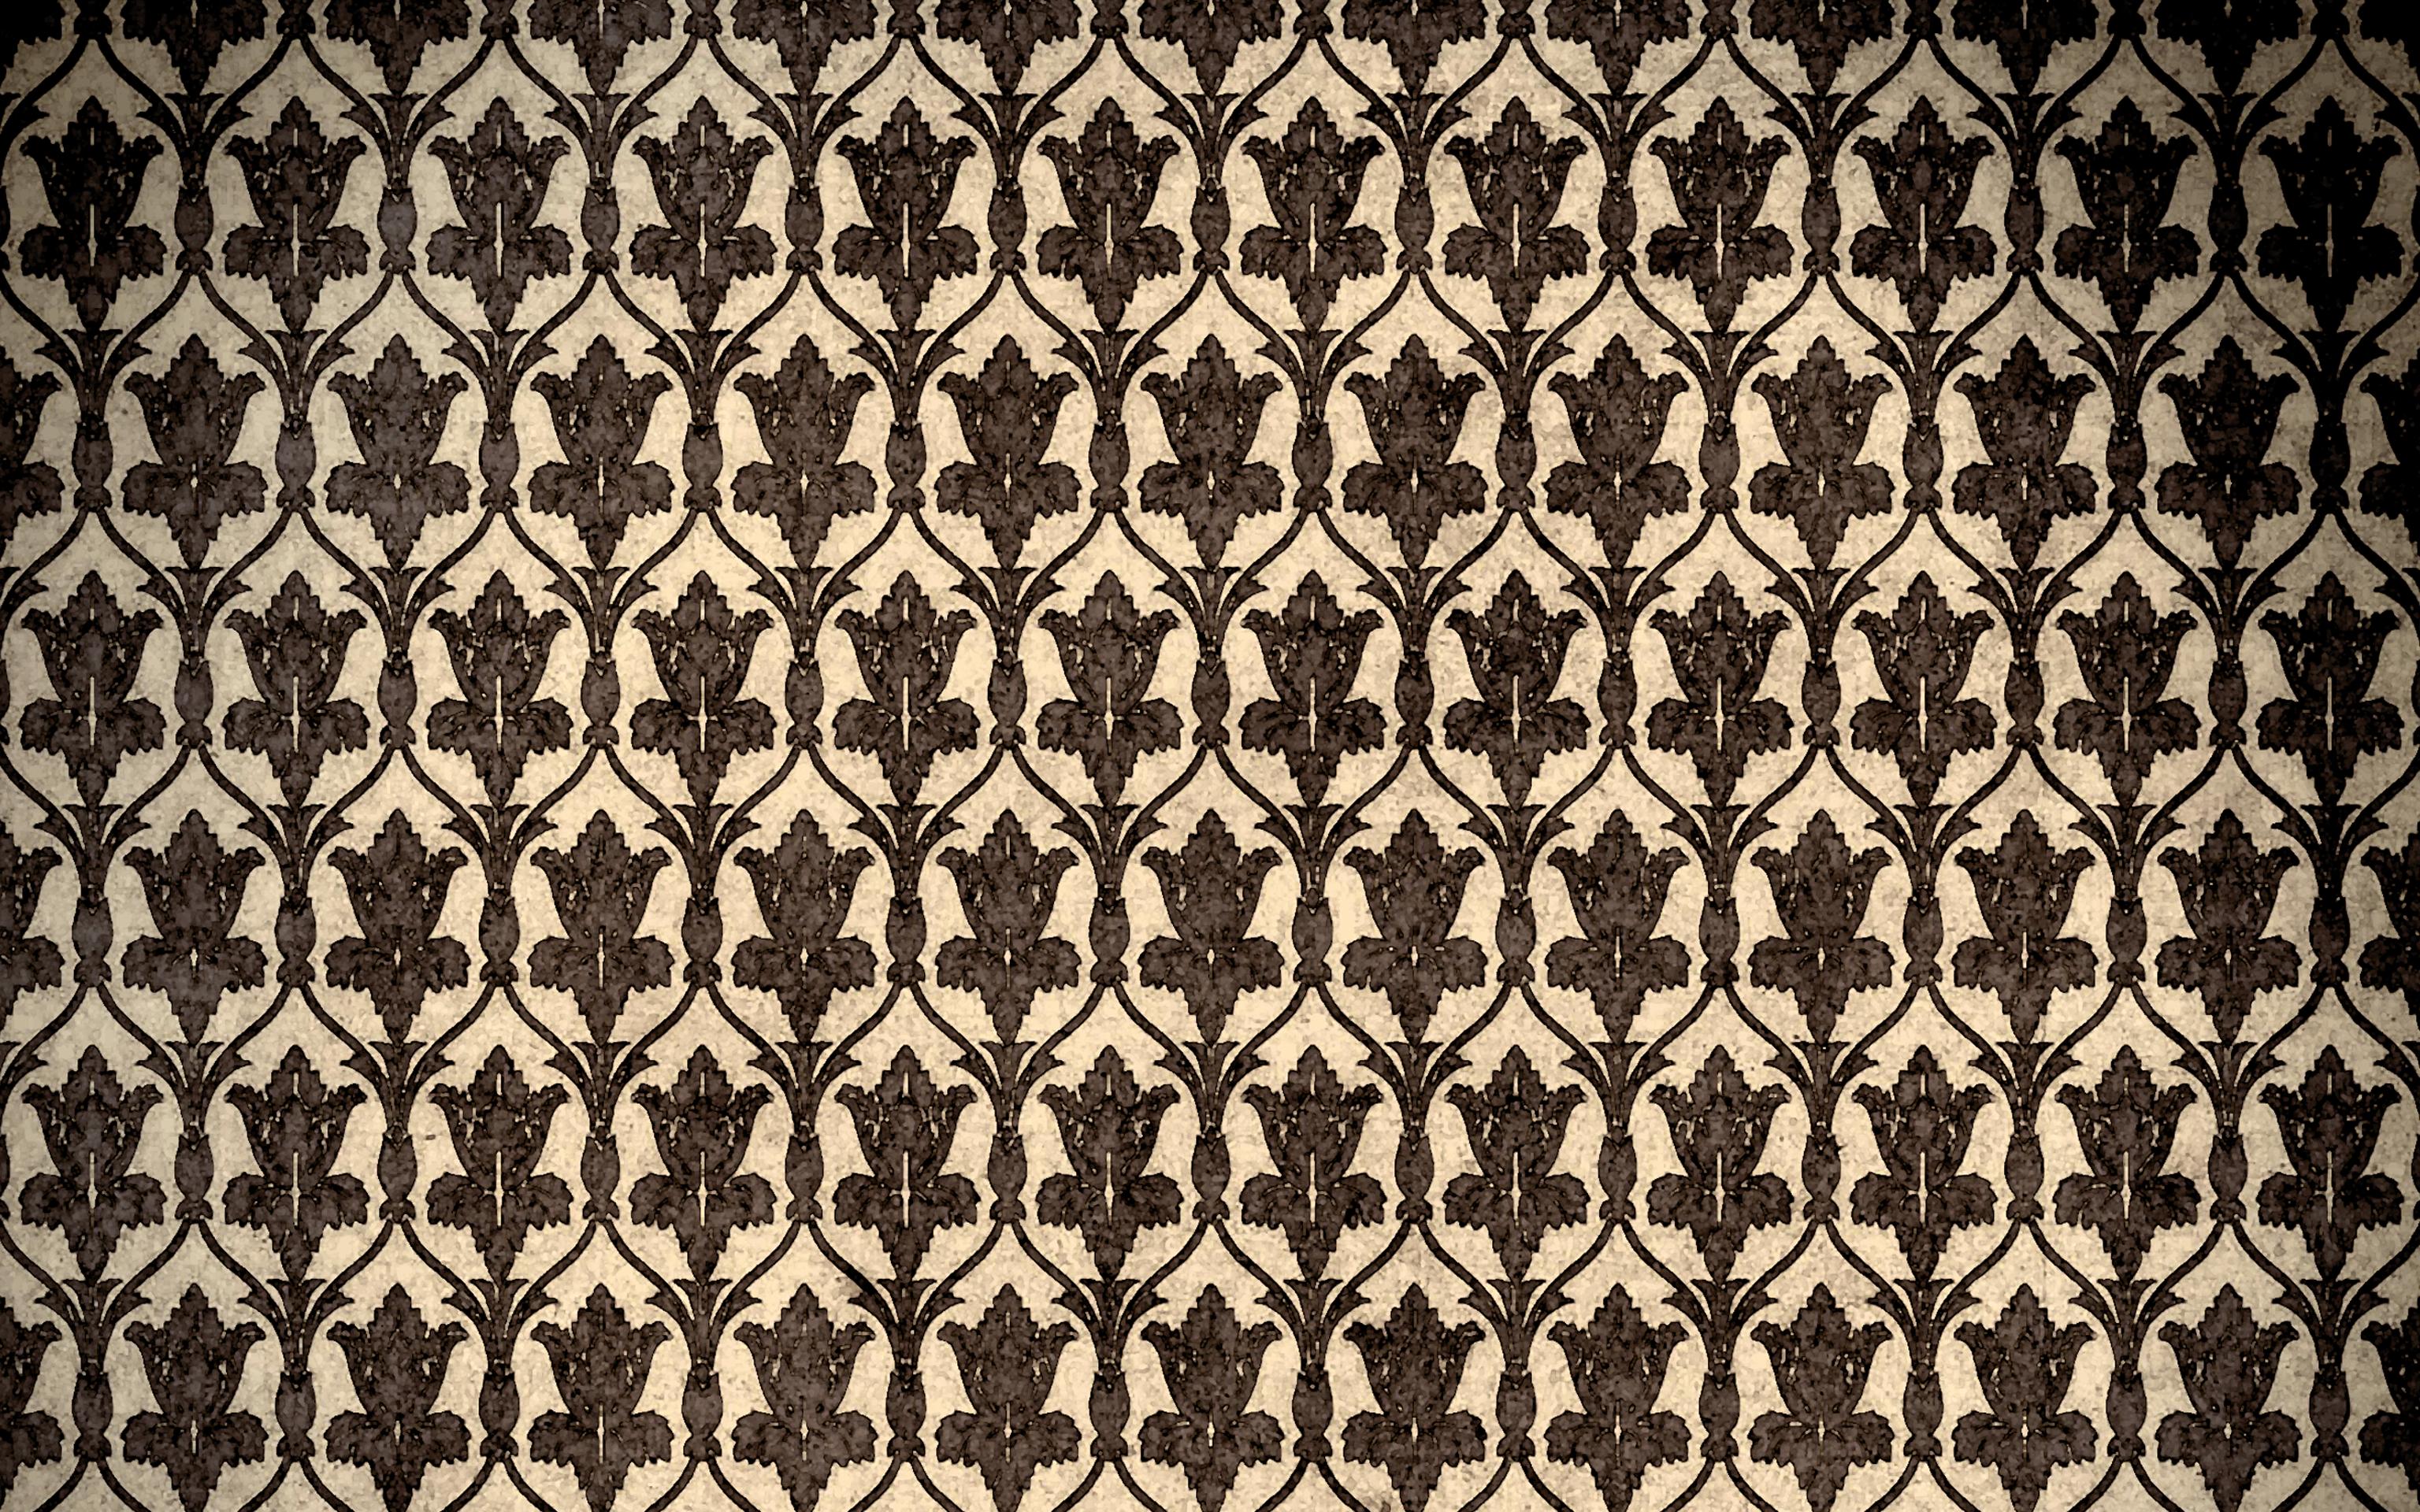 Bbc Sherlock Hd Wallpapers Chapter 1 Trishkafibble